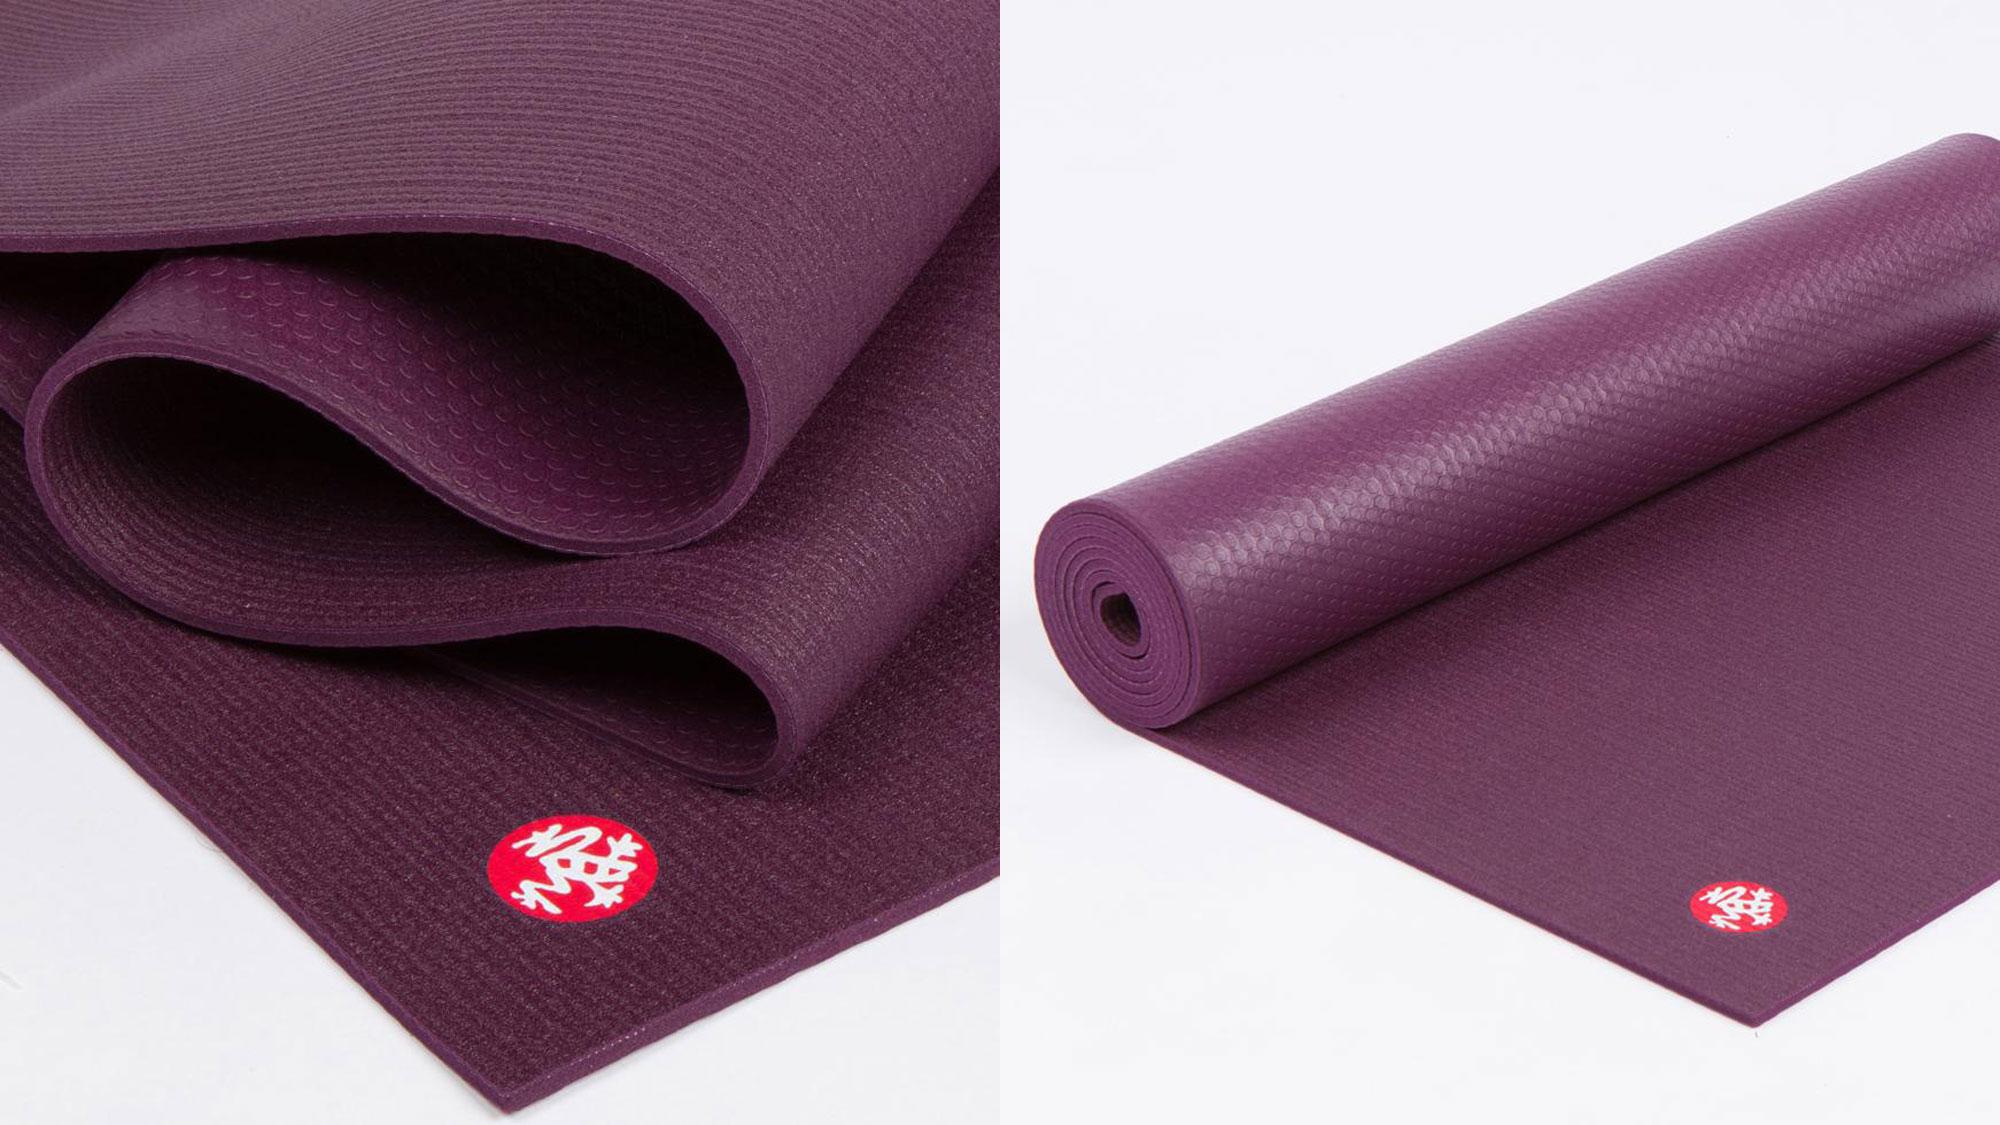 Best yoga mats: Manduka PROlite Yoga Mat